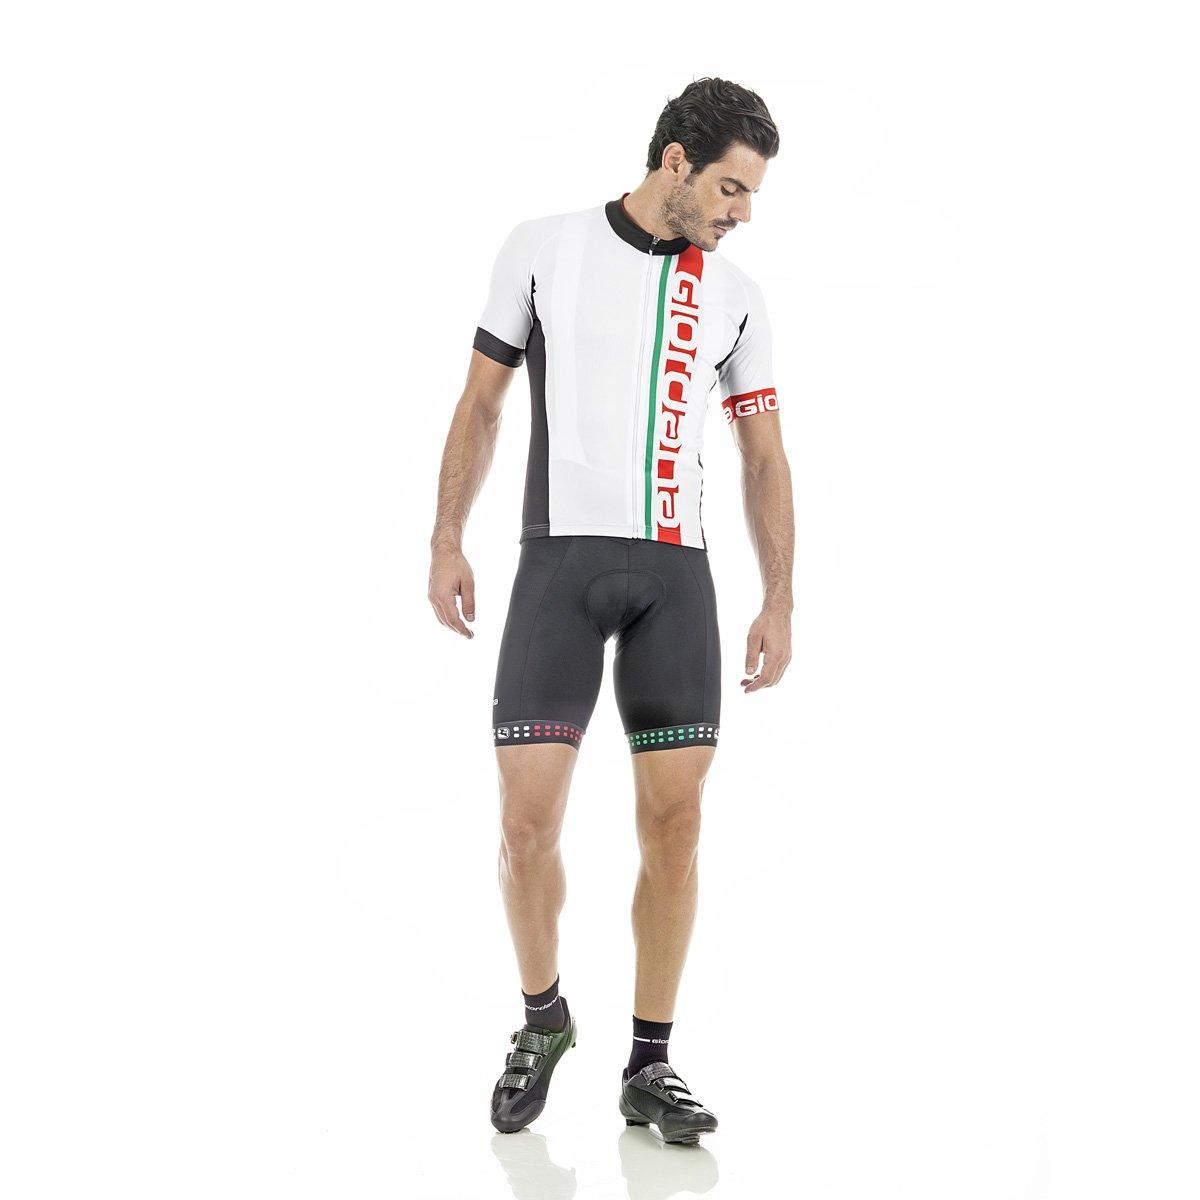 Giordana 2017 メンズ イタリア ベロ プロ 半袖 サイクリングジャージ - GICS17-SSJY-VERO-1988 Large WHITE/RED/GREEN B01NH9IZAC